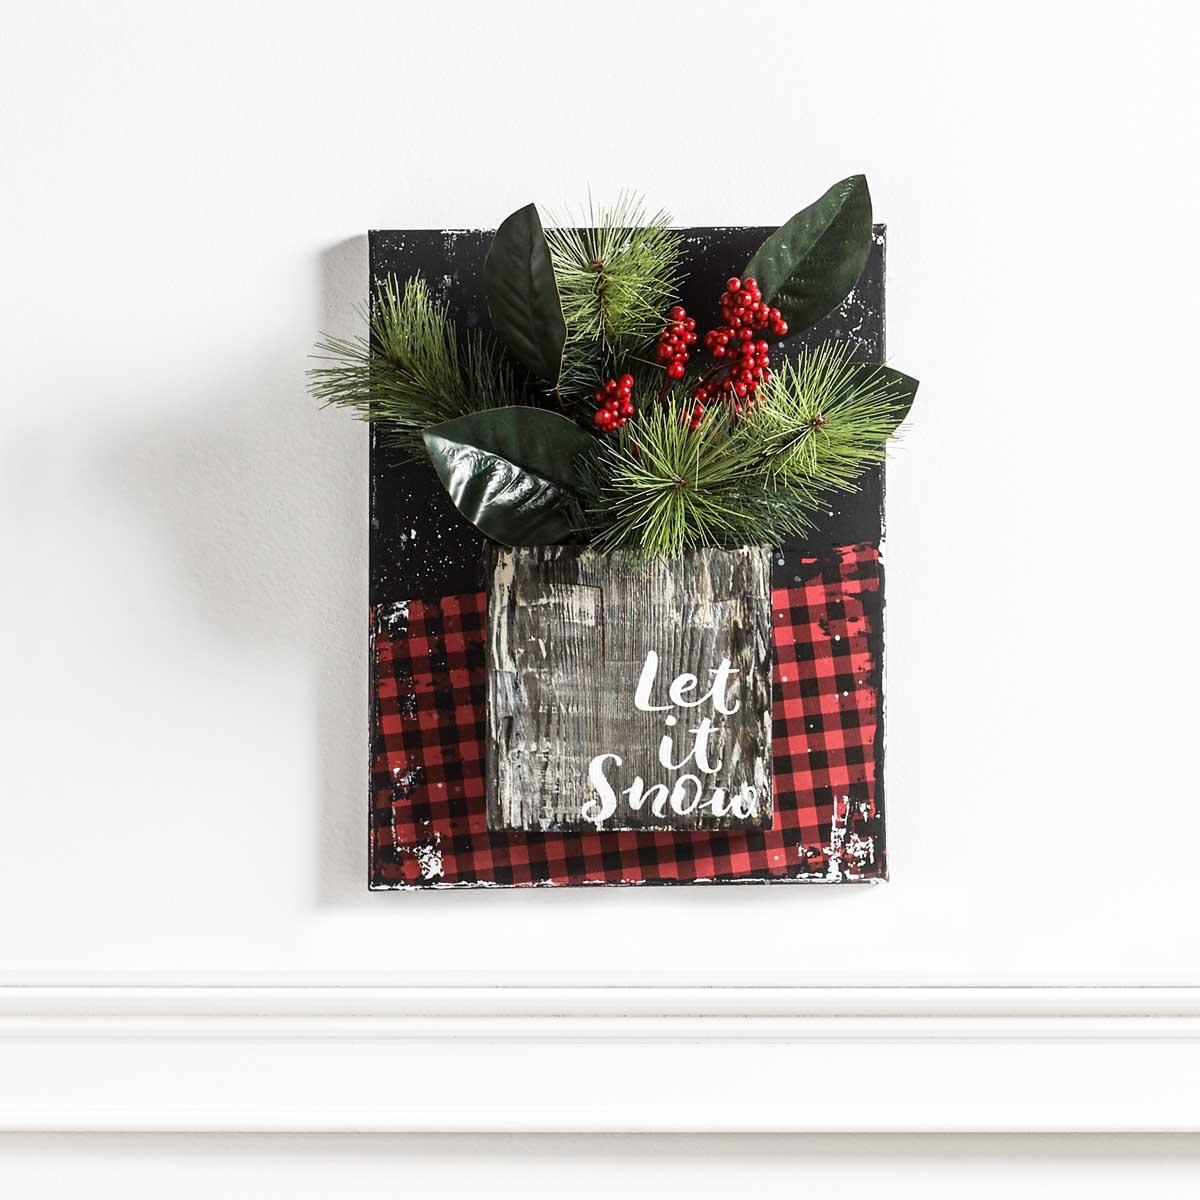 Holiday Cheer - 3D Floral Wall Art